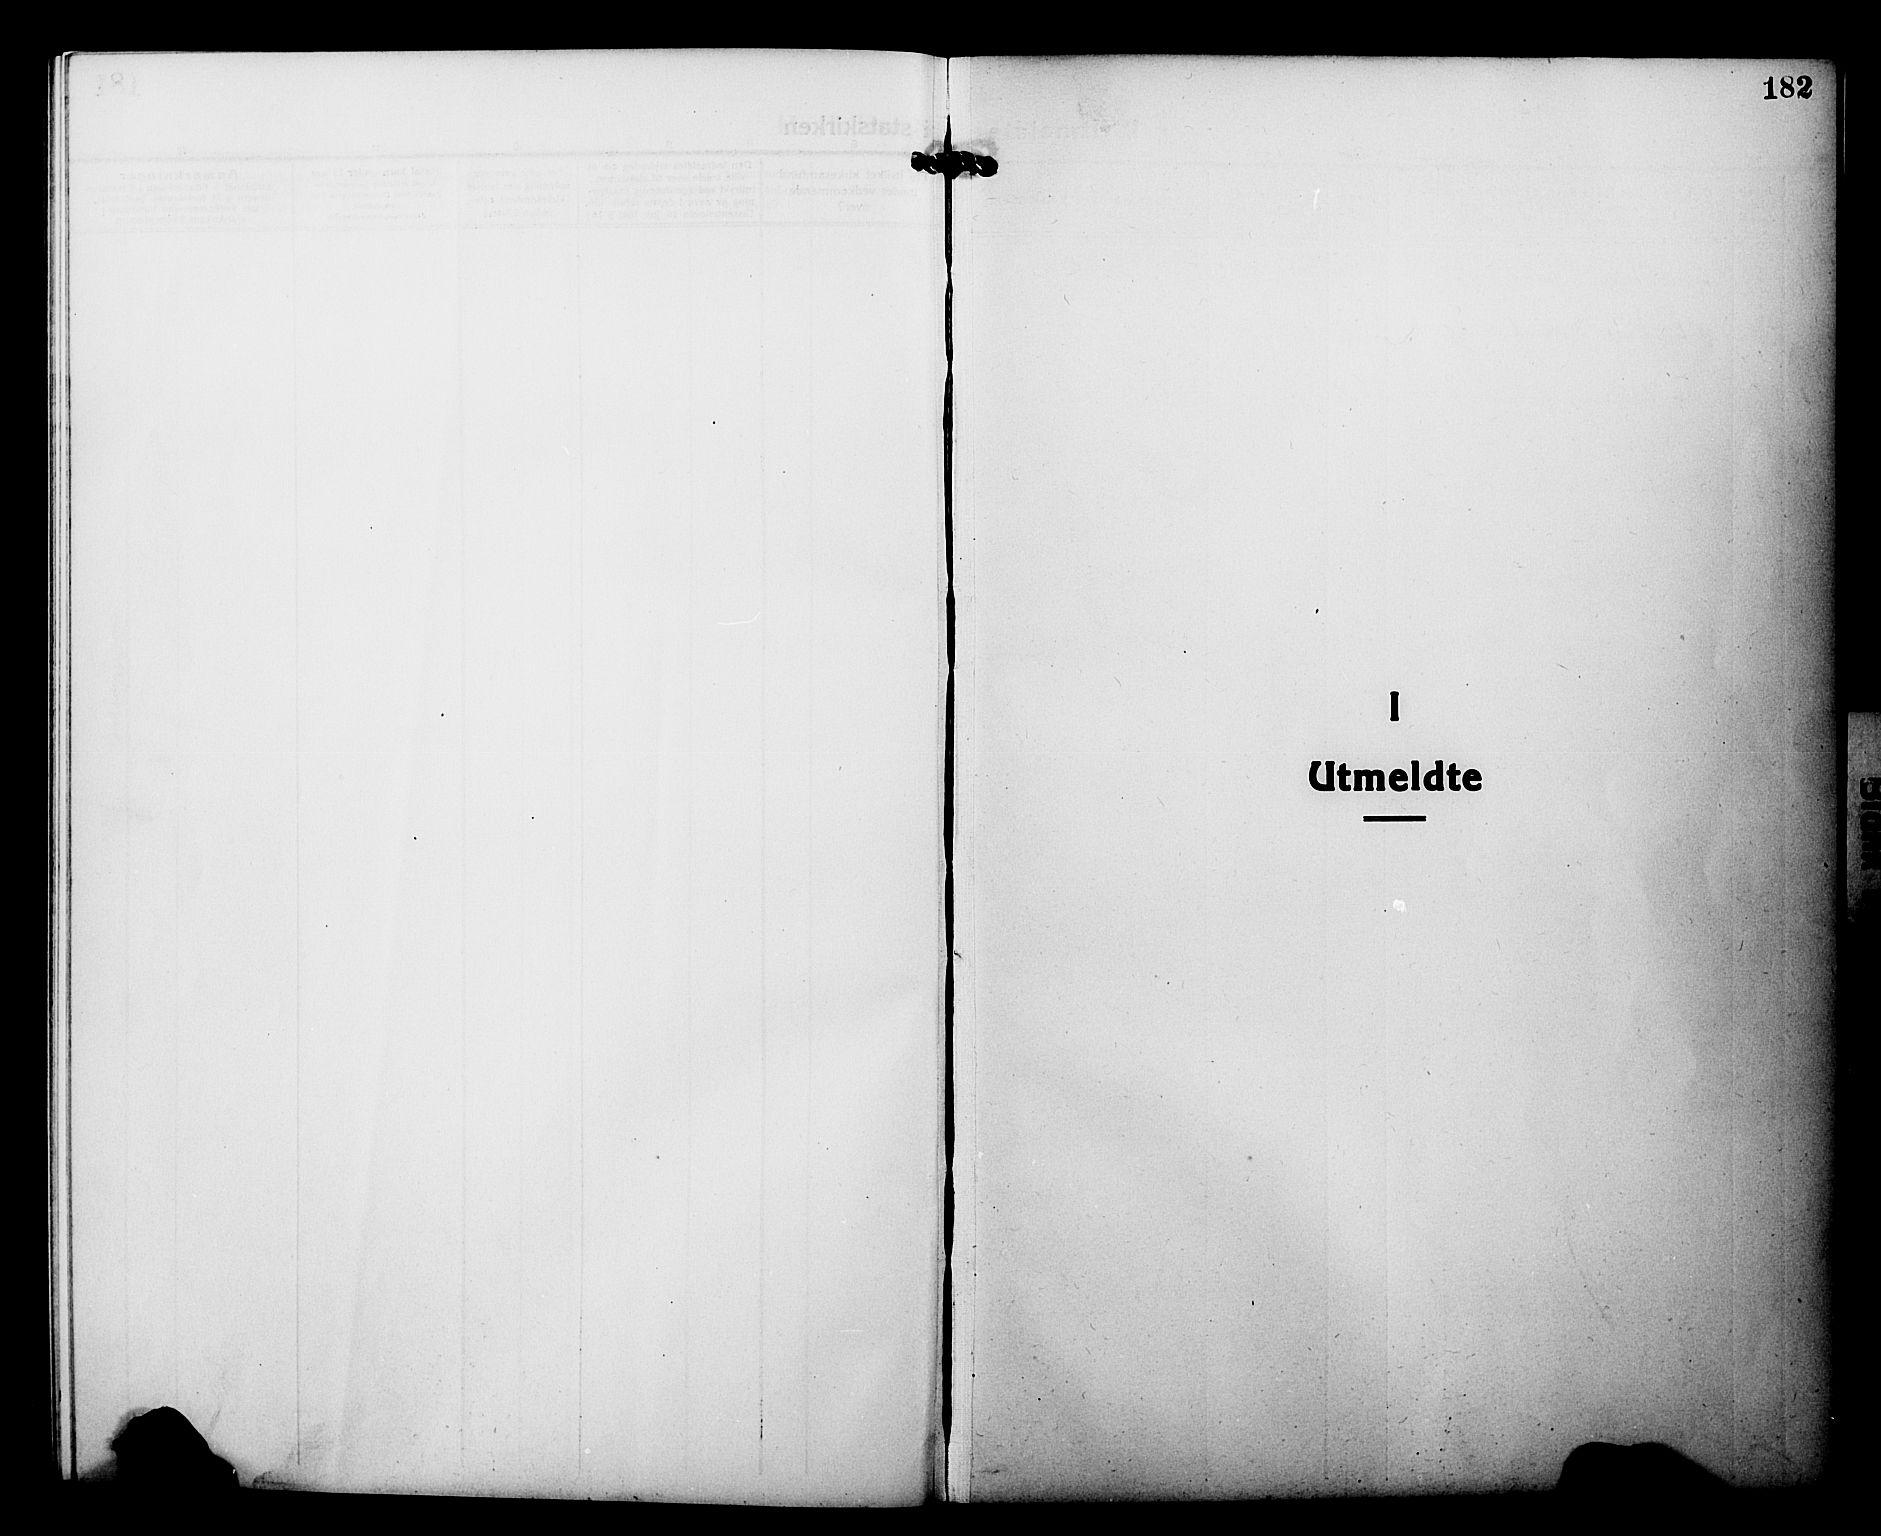 SATØ, Tranøy sokneprestkontor, I/Ia/Iab/L0015klokker: Klokkerbok nr. 15, 1918-1930, s. 182